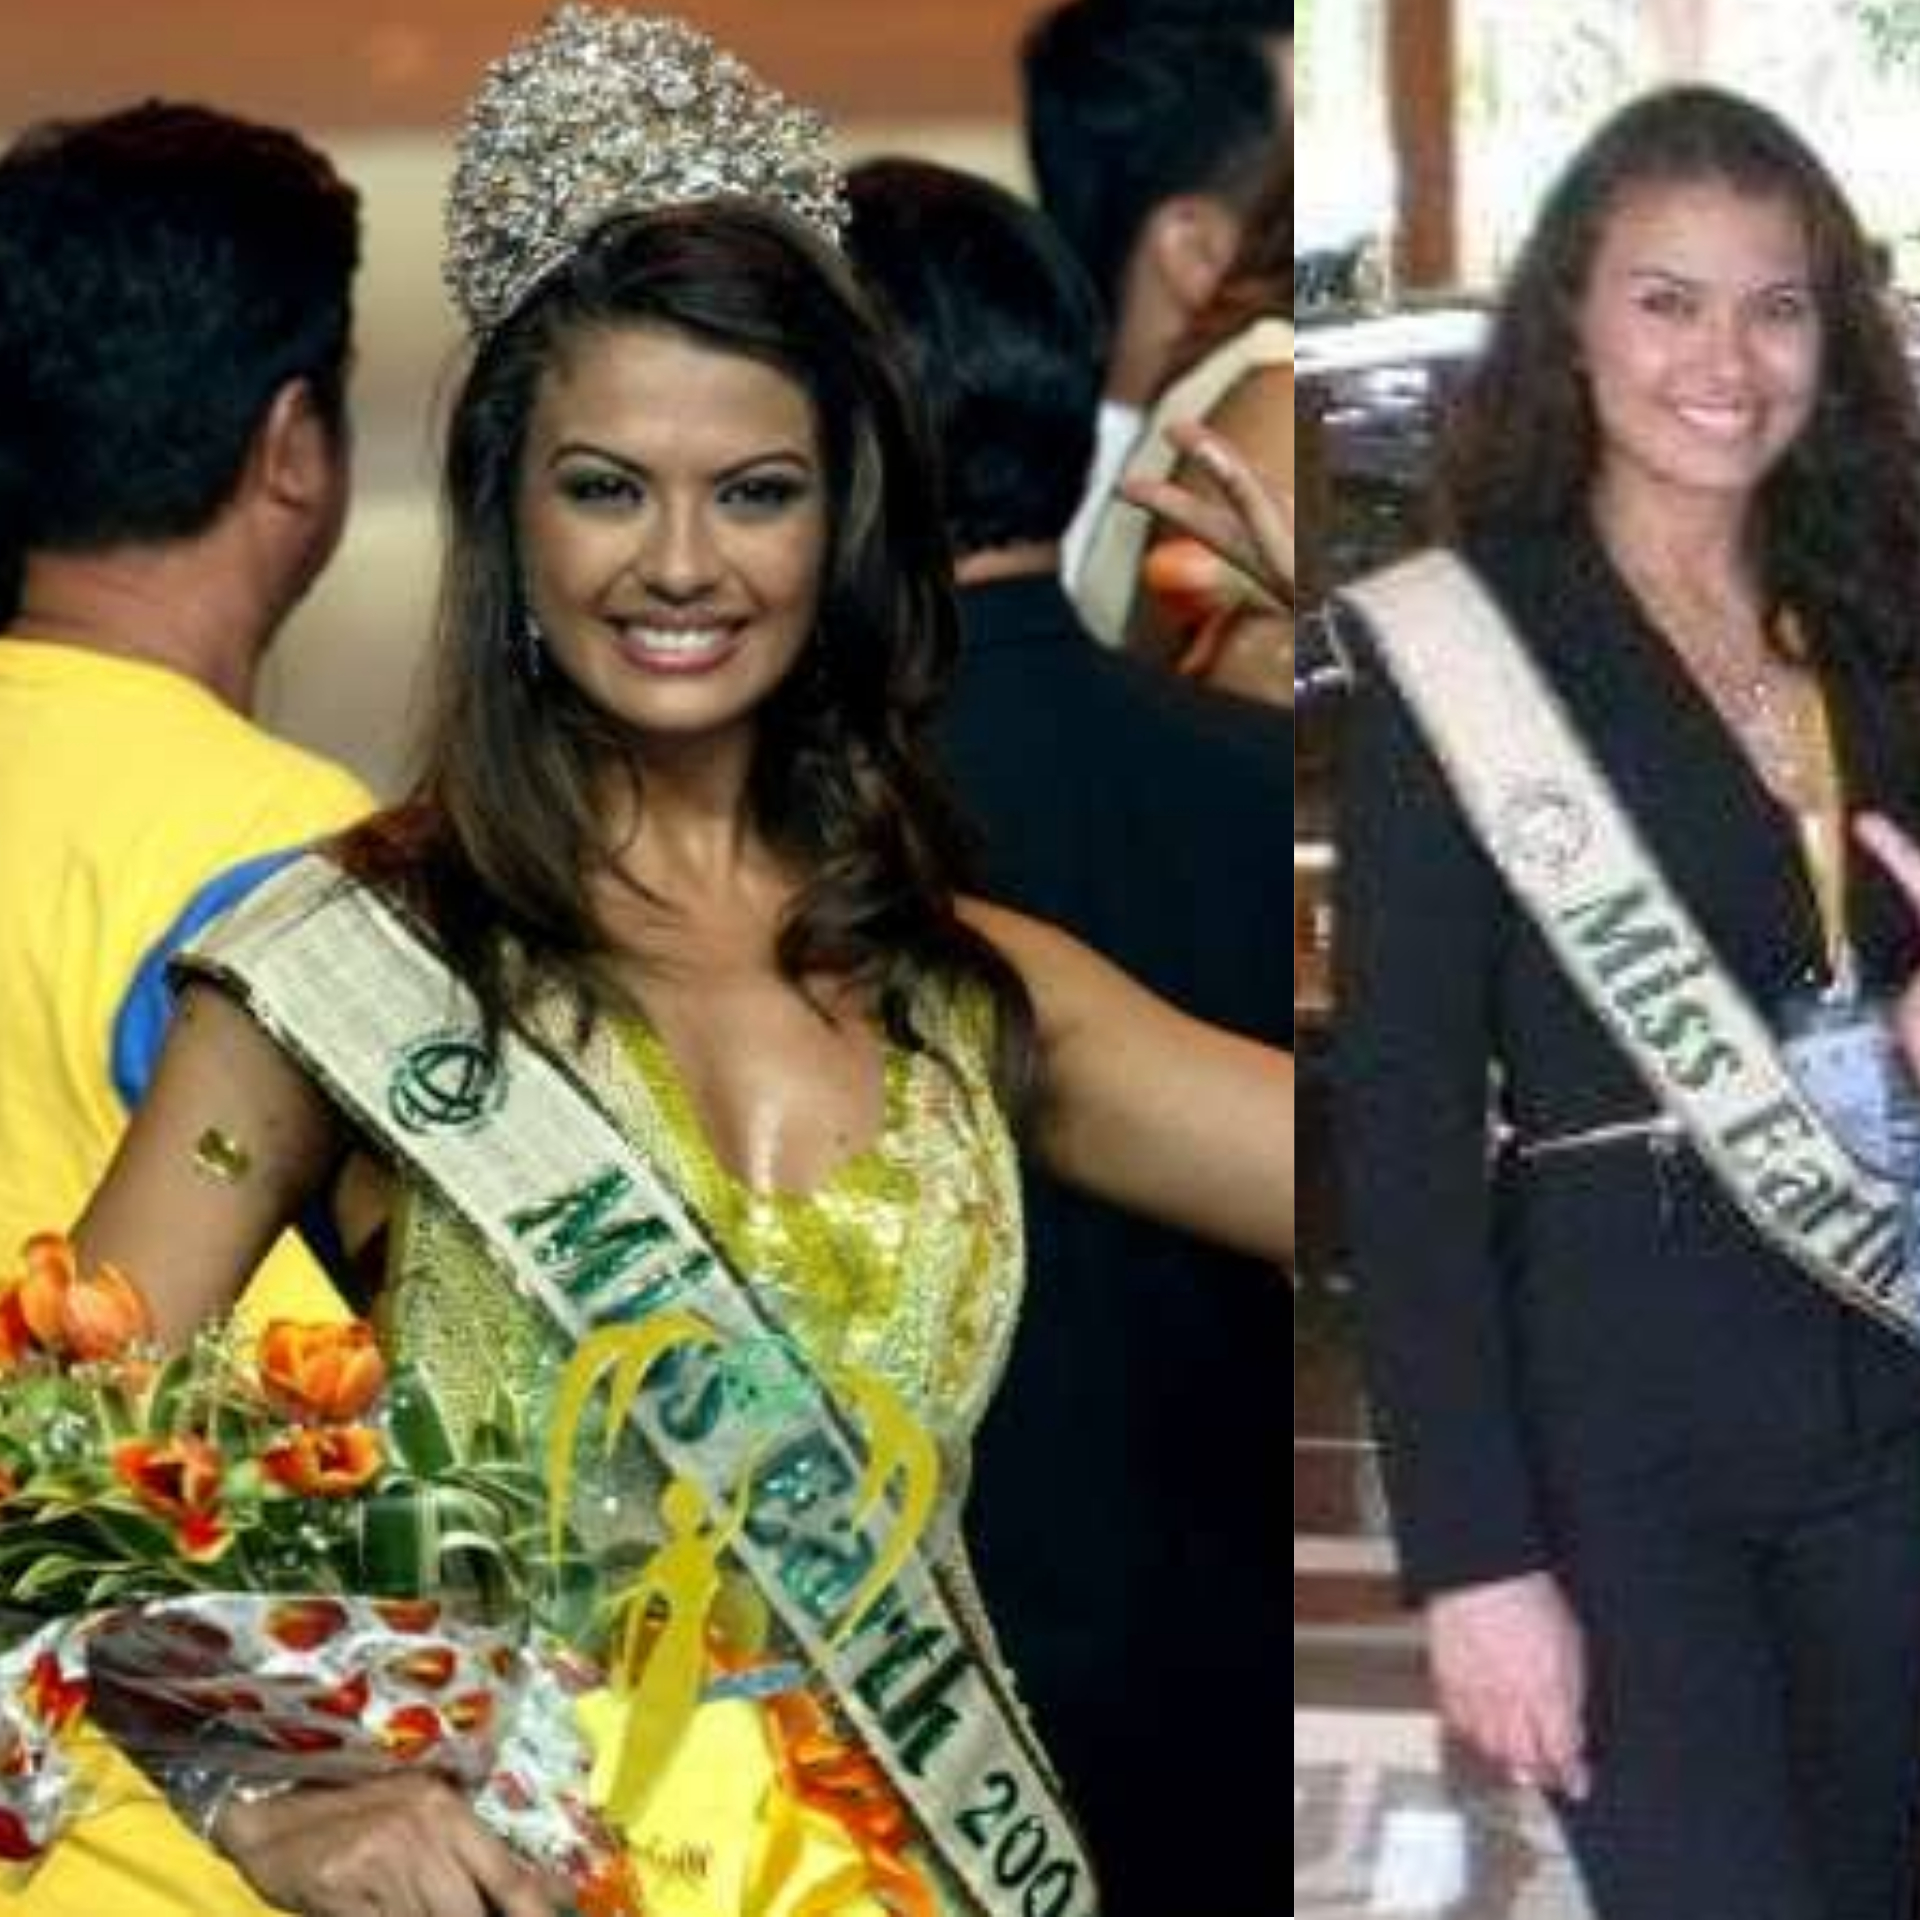 Priscilla-Mireiles-Miss-Earth-2004